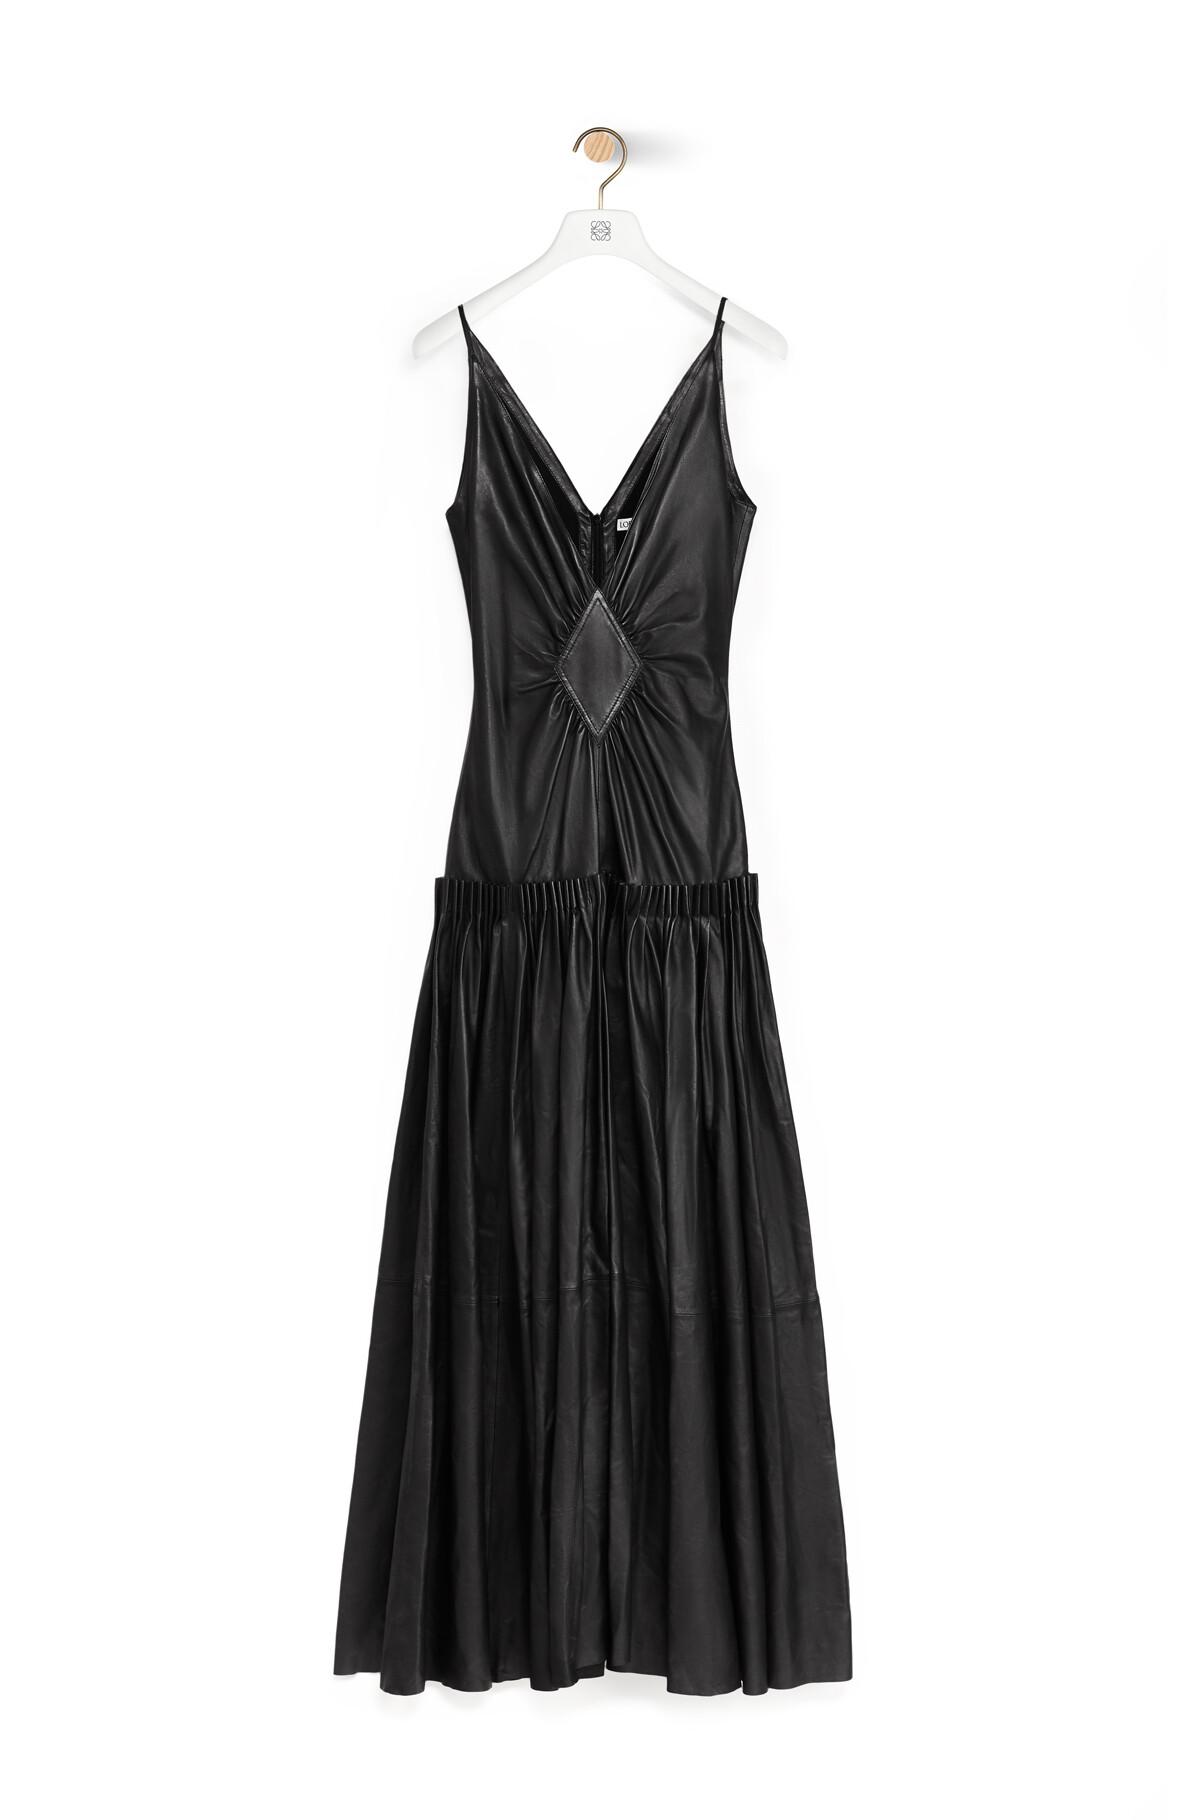 LOEWE Vestido Tirantes Negro front